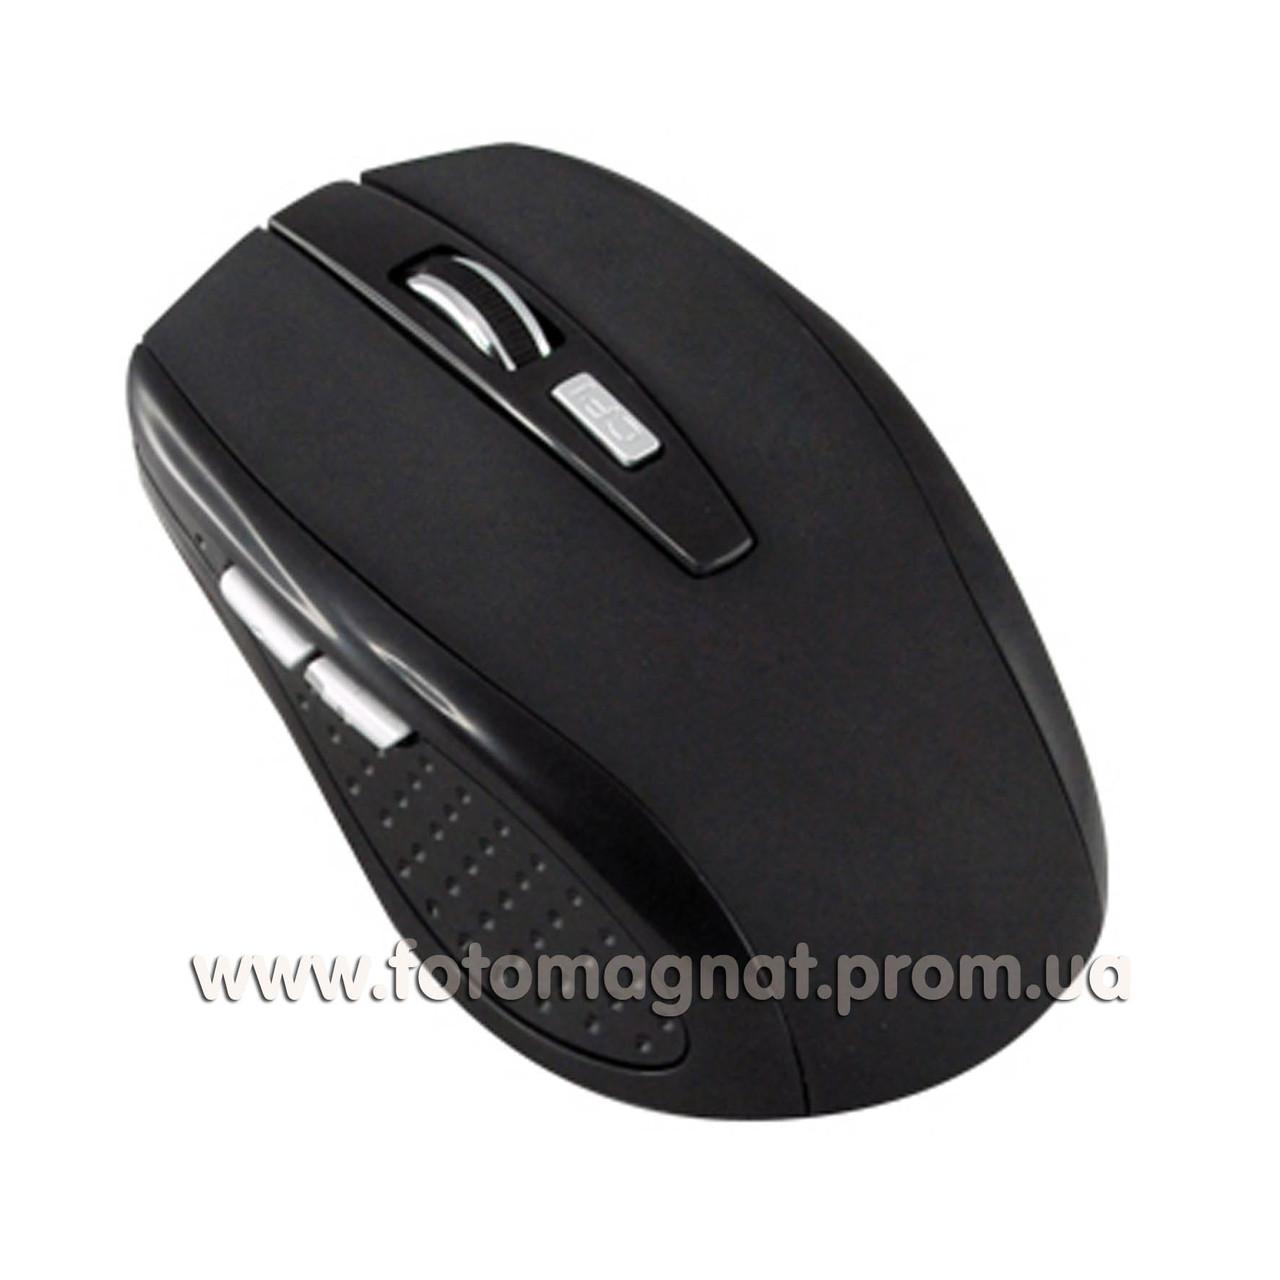 Мышка для компьютера беспроводная HAVIT  HV-MS813GT Wireless USB